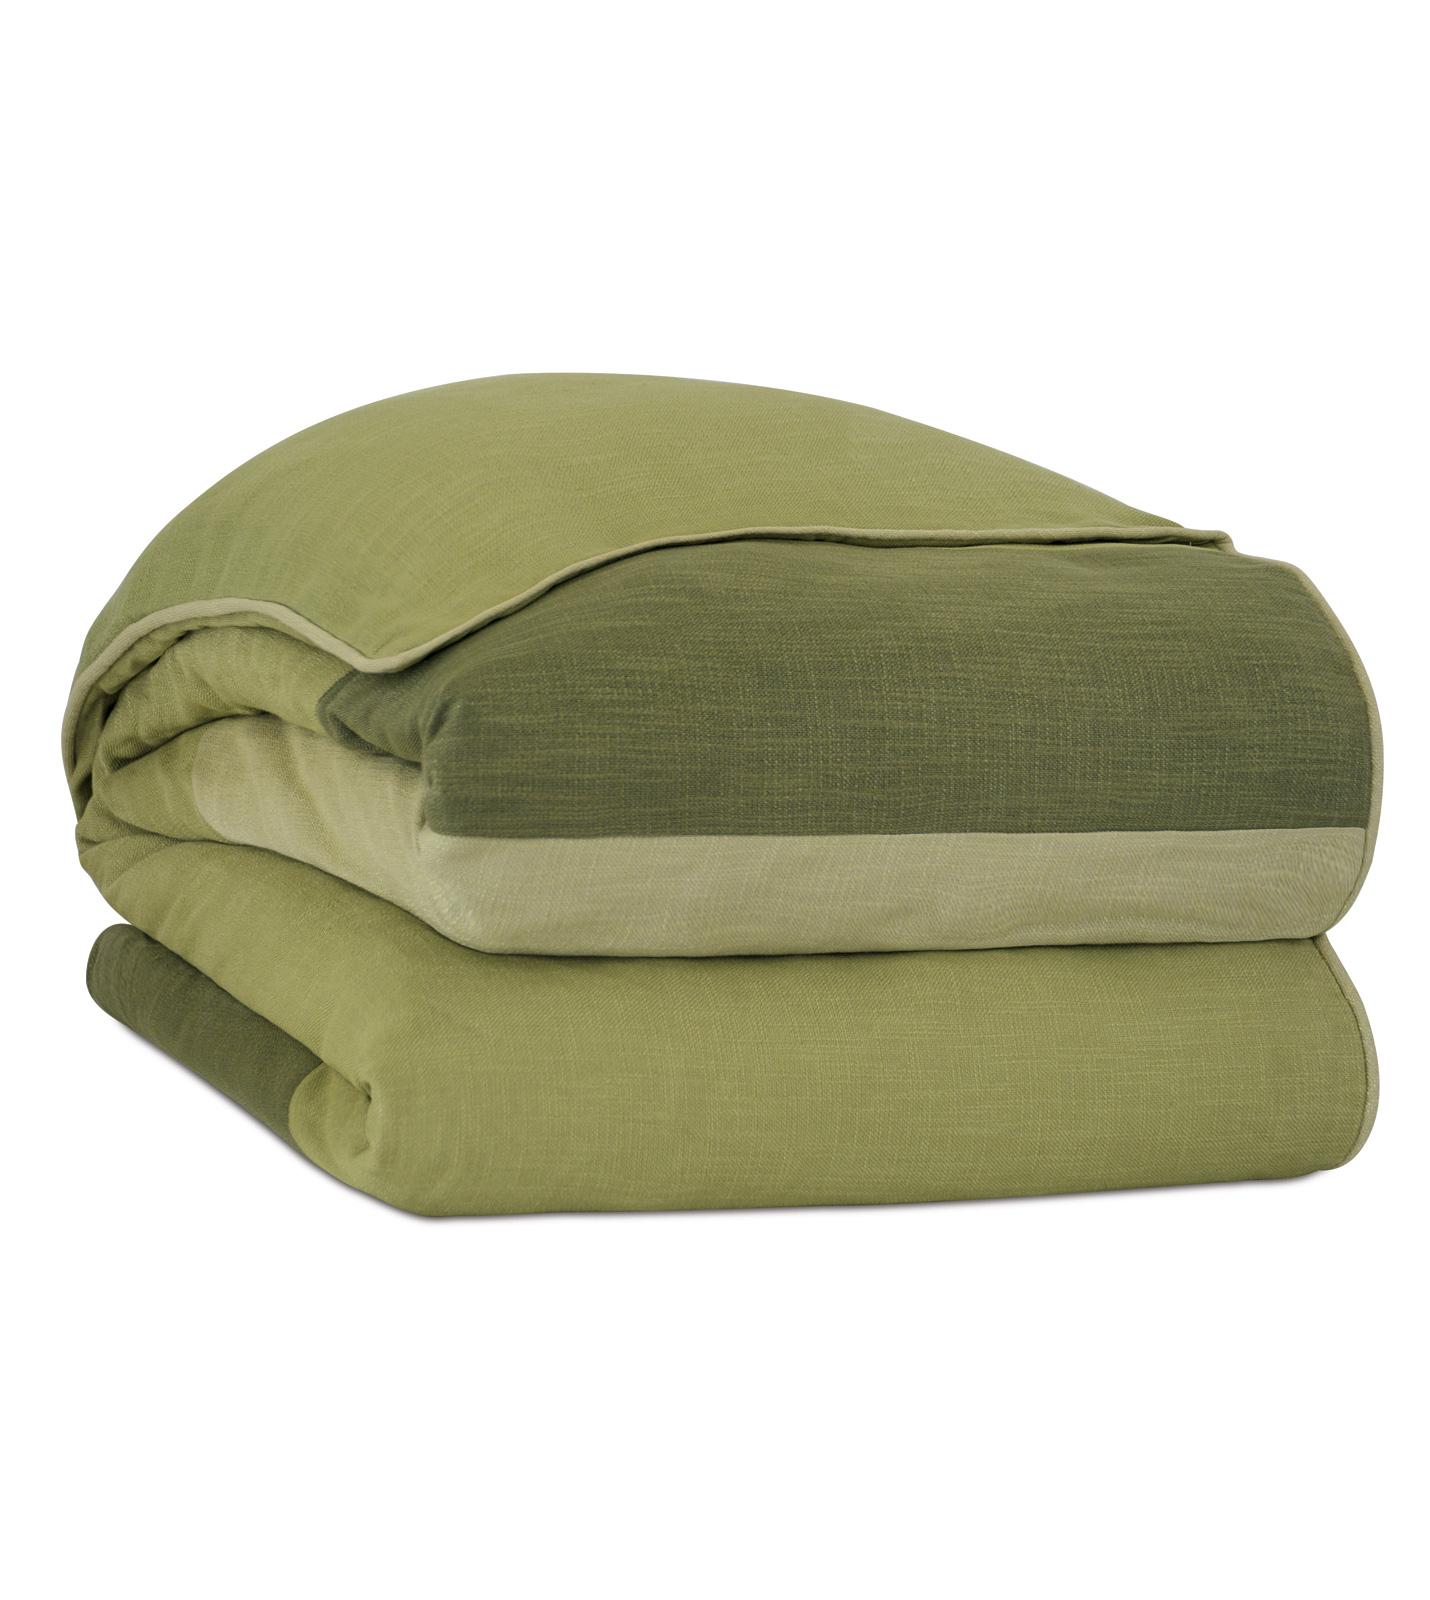 Luxury Bedding By Eastern Accents Haberdash Apple Duvet